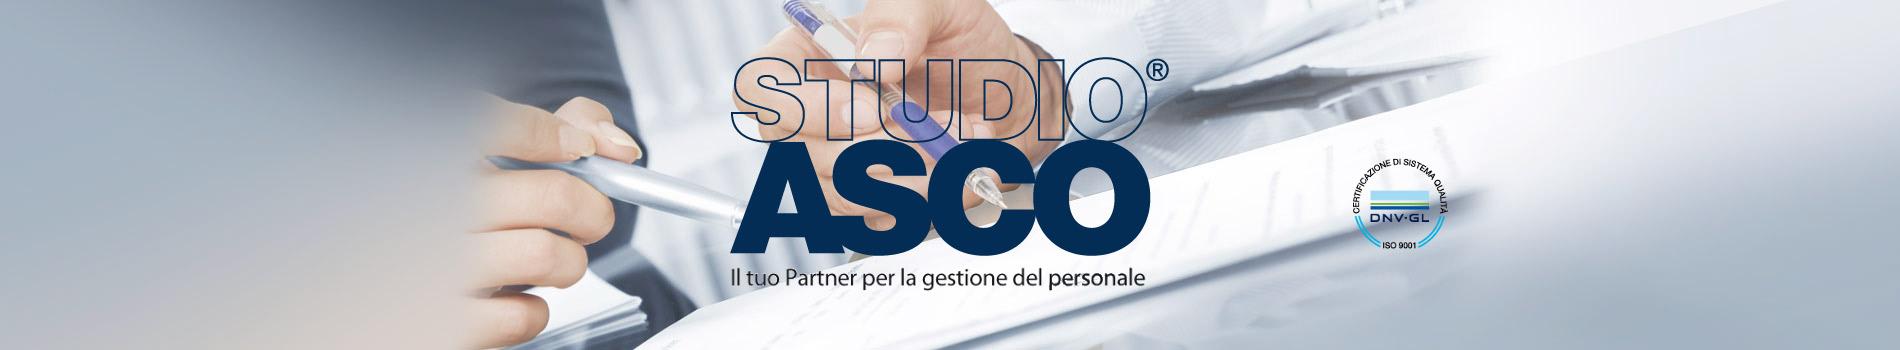 consulenti-lavoro-torino-slider-STUDIOASCO